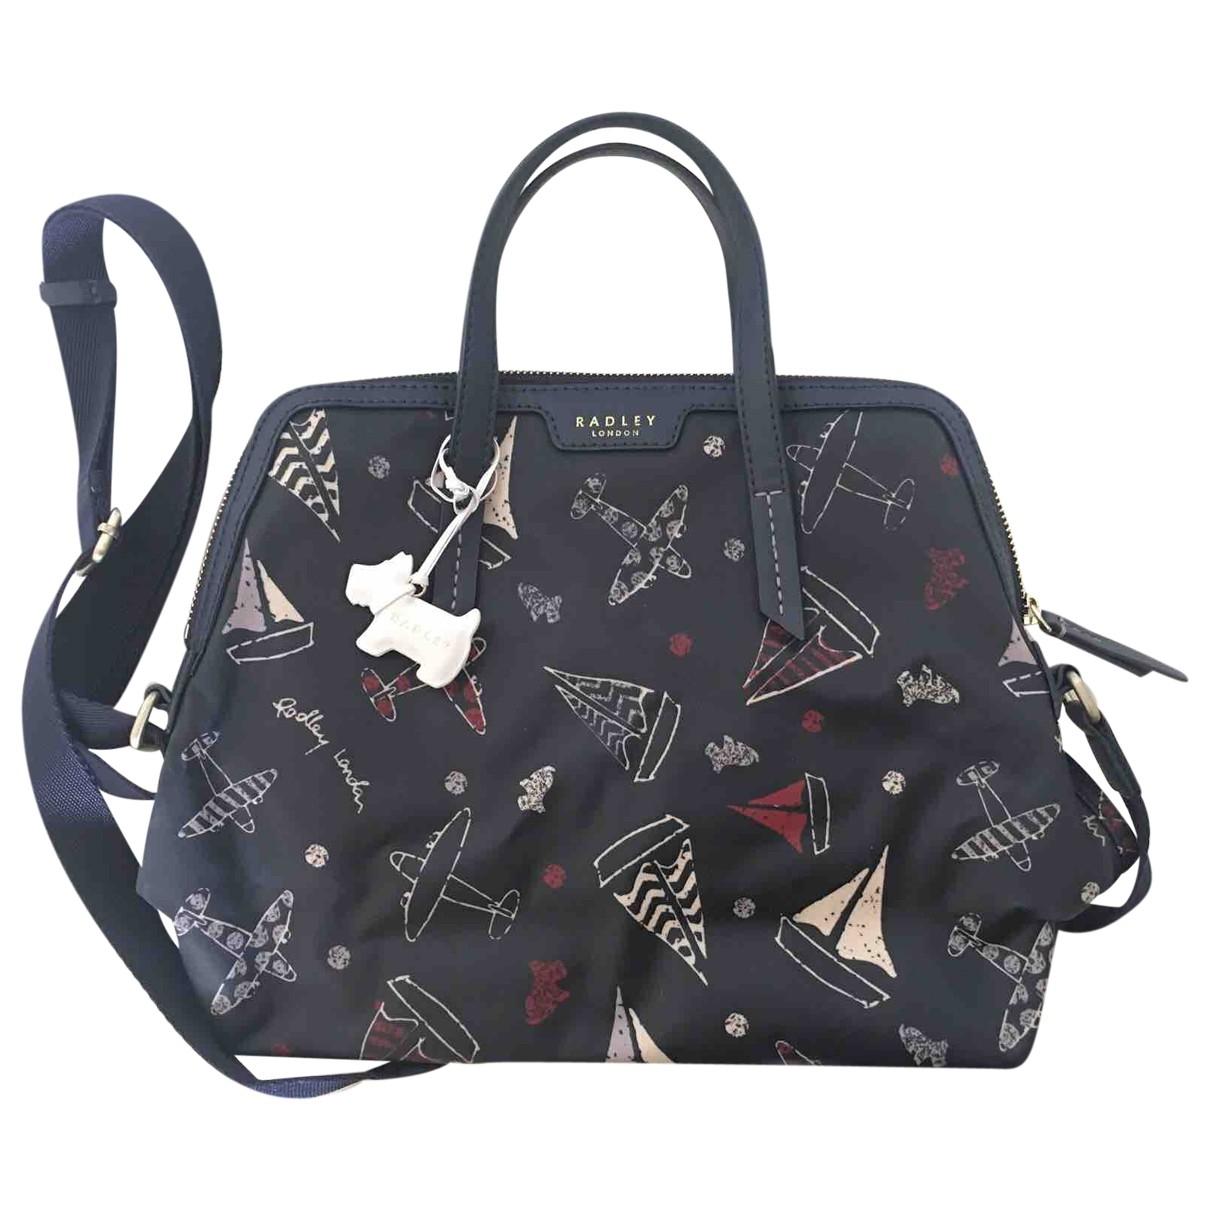 Radley London \N Navy handbag for Women \N